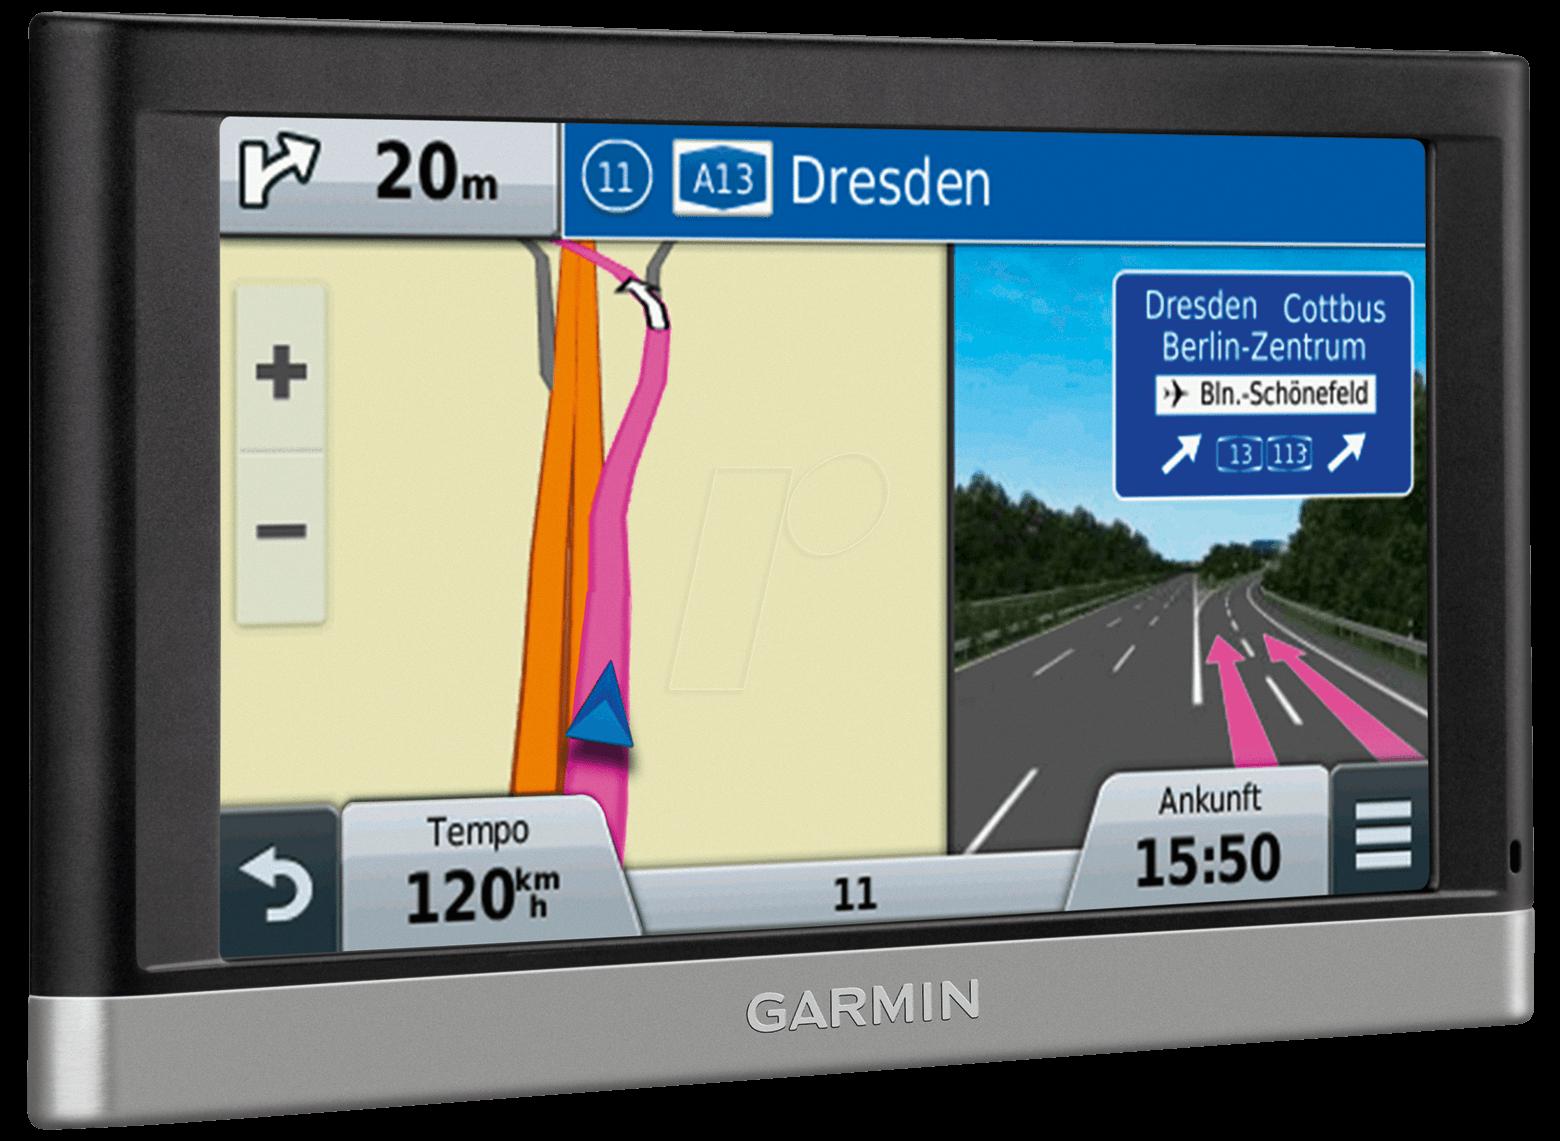 Garmin Nuvi 2598LMT D 5 GPS SATNAV UK Europe Lifetime Maps Digital